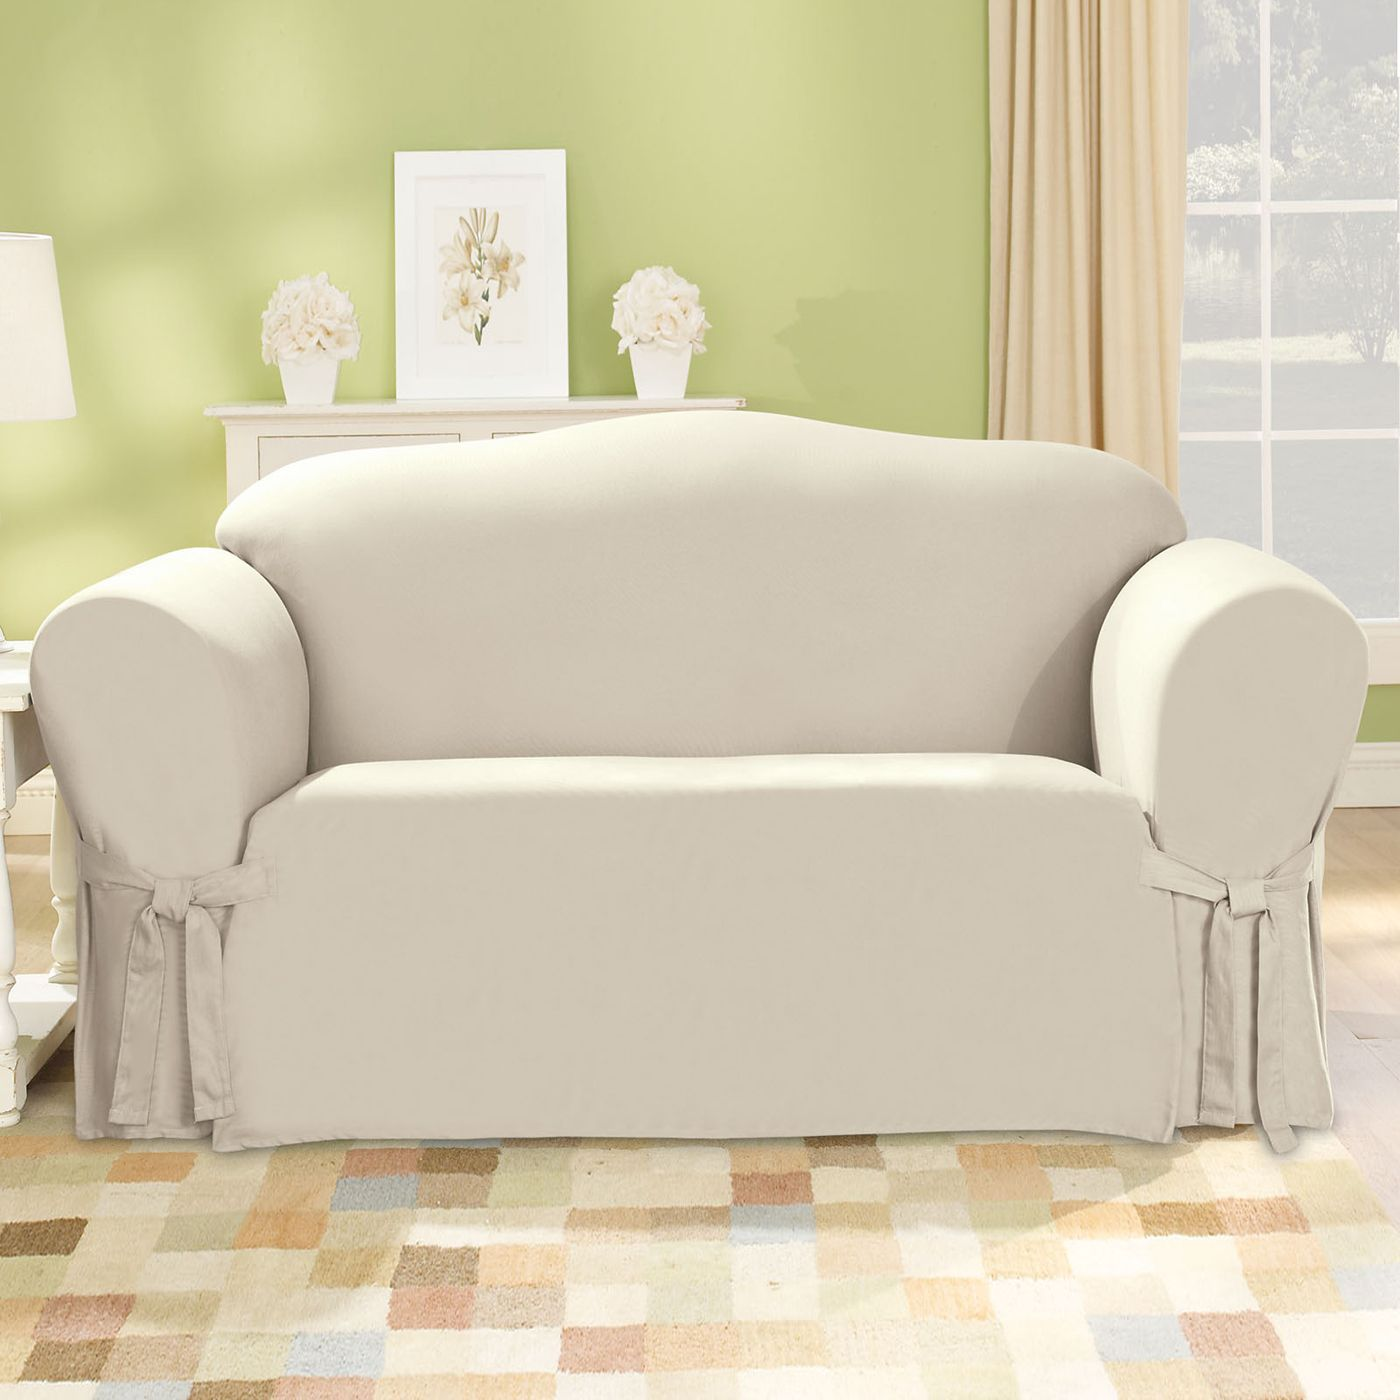 Stupendous Pin By Danette Marisa On Home Decor Sofa Covers Sofa Dailytribune Chair Design For Home Dailytribuneorg